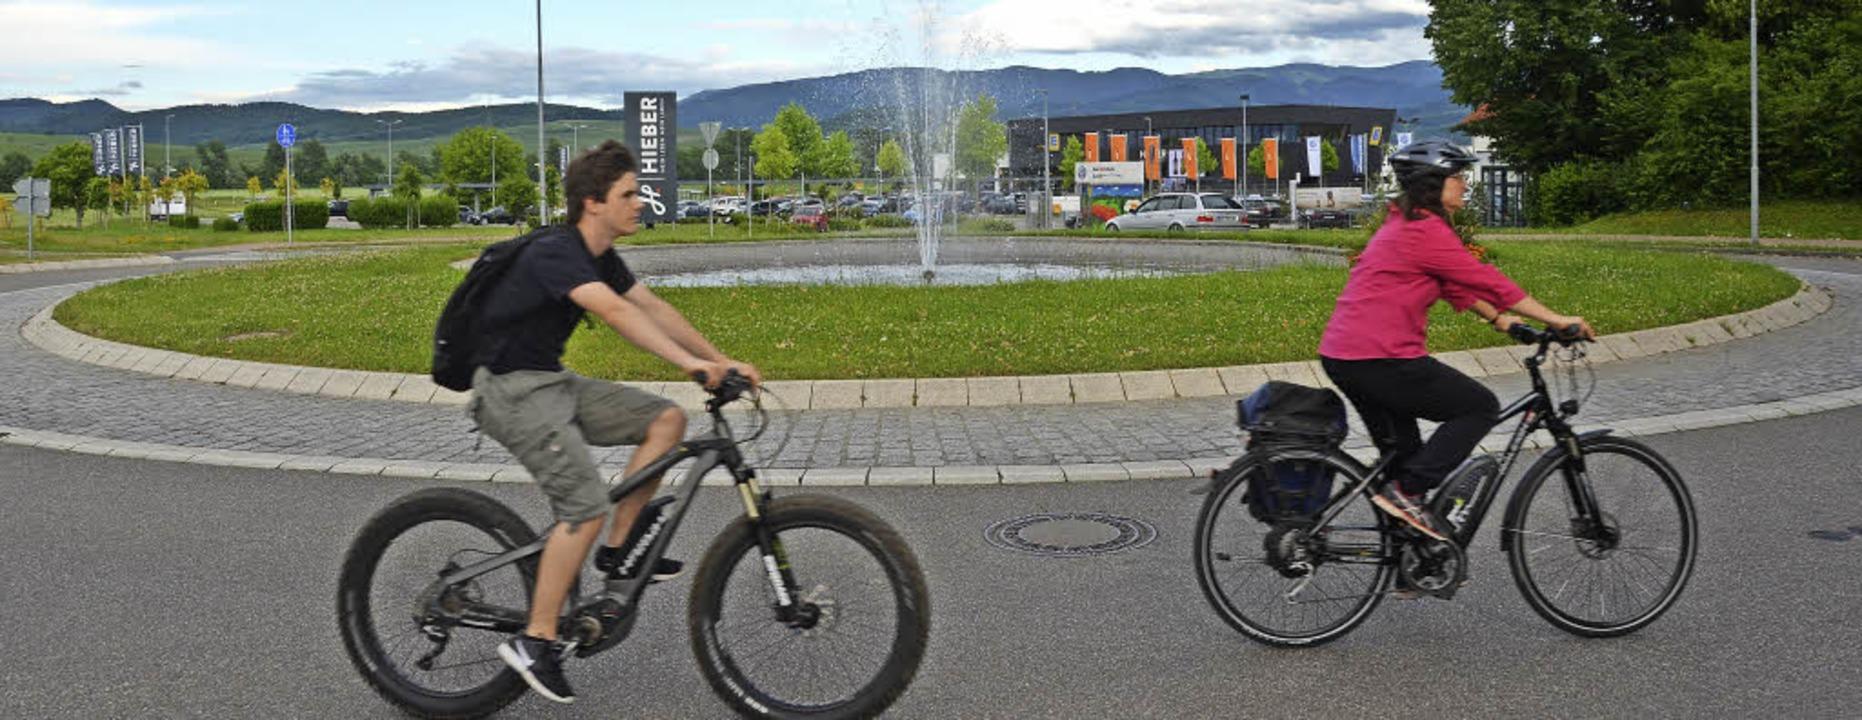 Kreisverkehr VI beim Hieber Ortseingang Bad Krozingen  | Foto: Sebastian Krüger